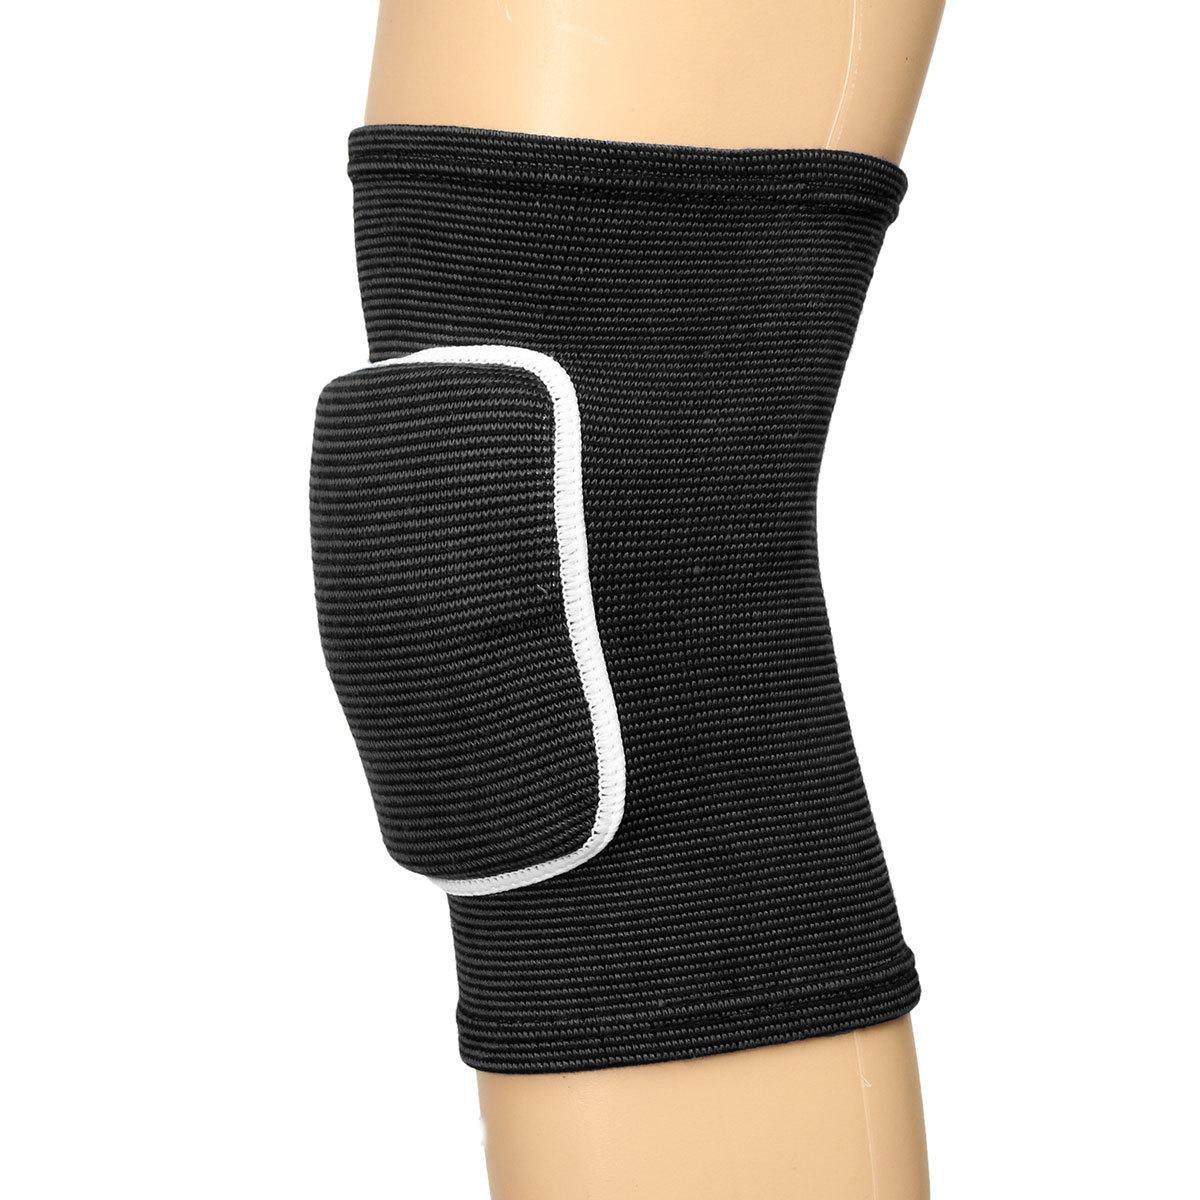 Penyangga lutut yang dapat disesuaikan tali dukungan Pad penjaga pelindung olahraga Gym nyaman hitam L .